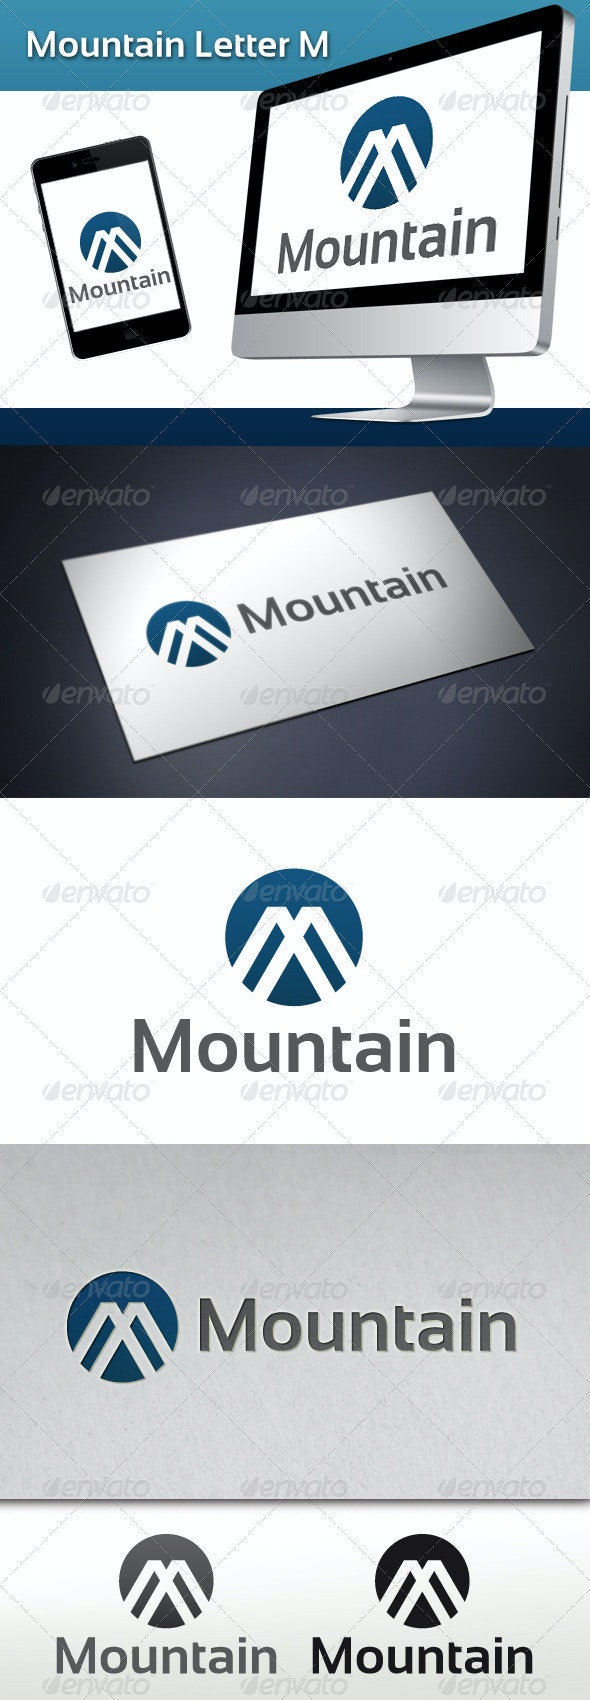 Mountain Letter M Logo - Abstract Logo Templates